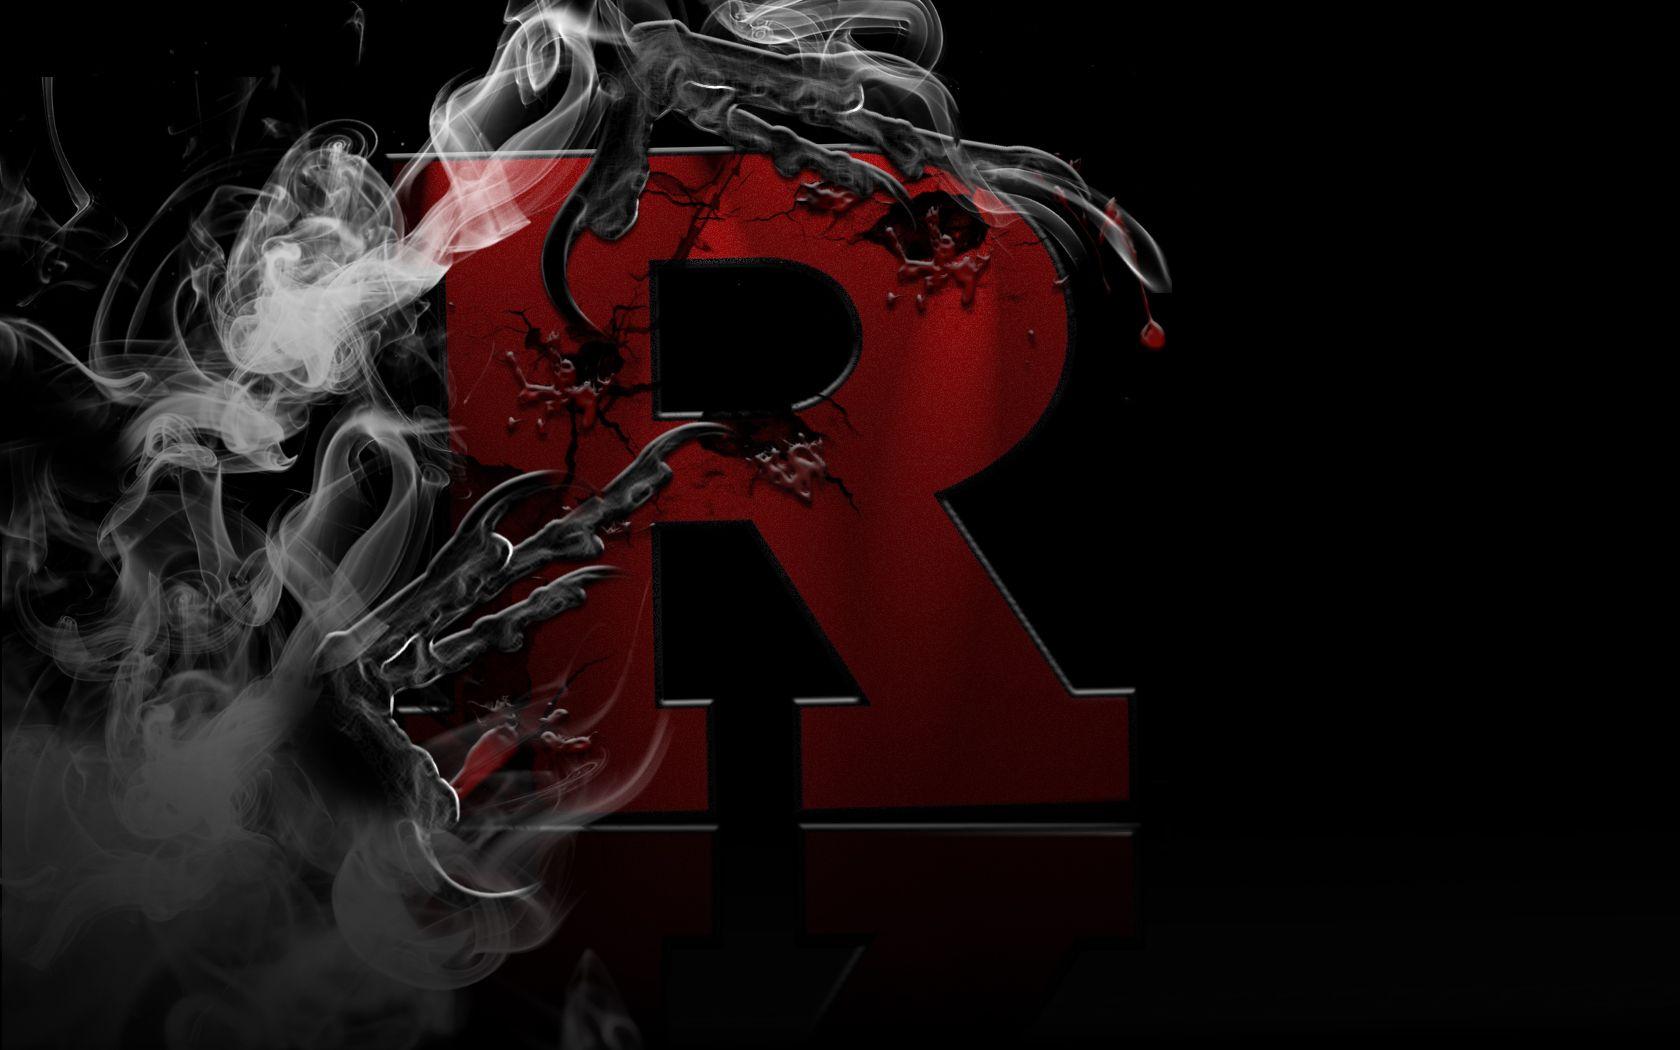 Pin By Boris Poljovka On R Is For Rabena And Rehan Desktop Wallpaper Art Creative Graphics Wallpaper